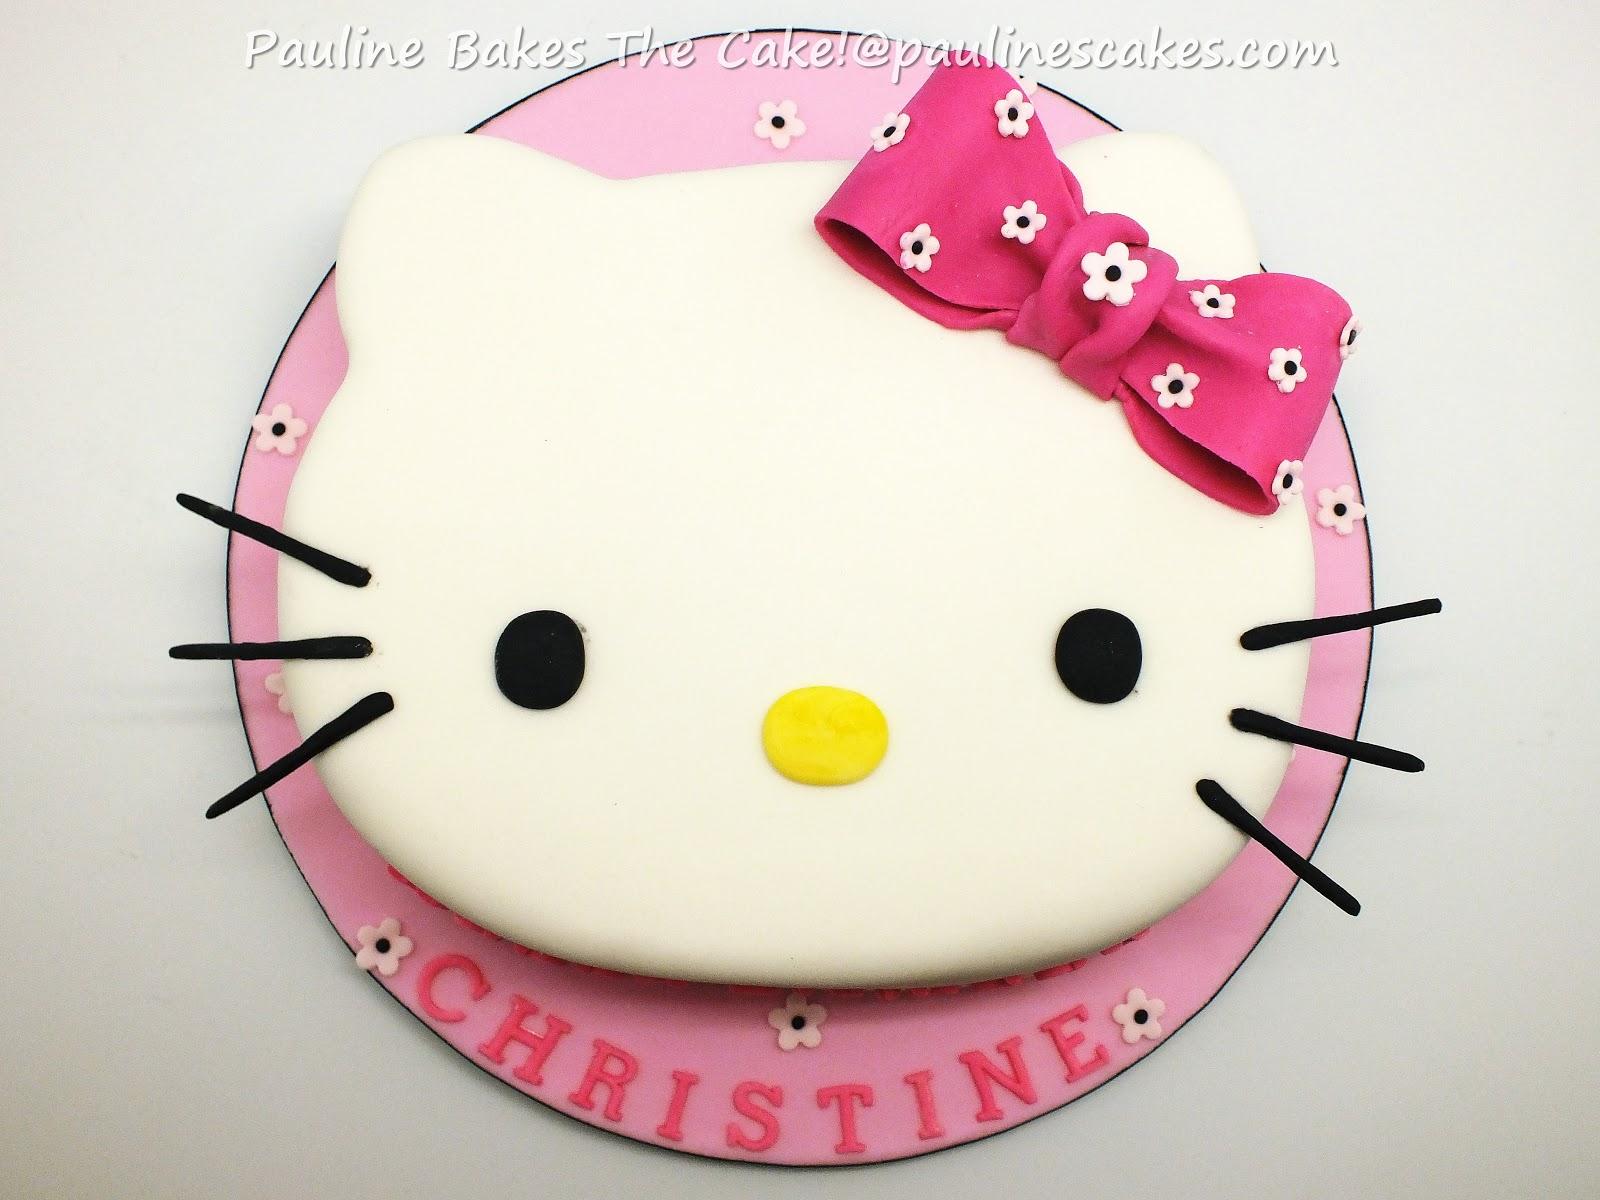 PAULINE BAKES THE CAKE Hello Kittys Face